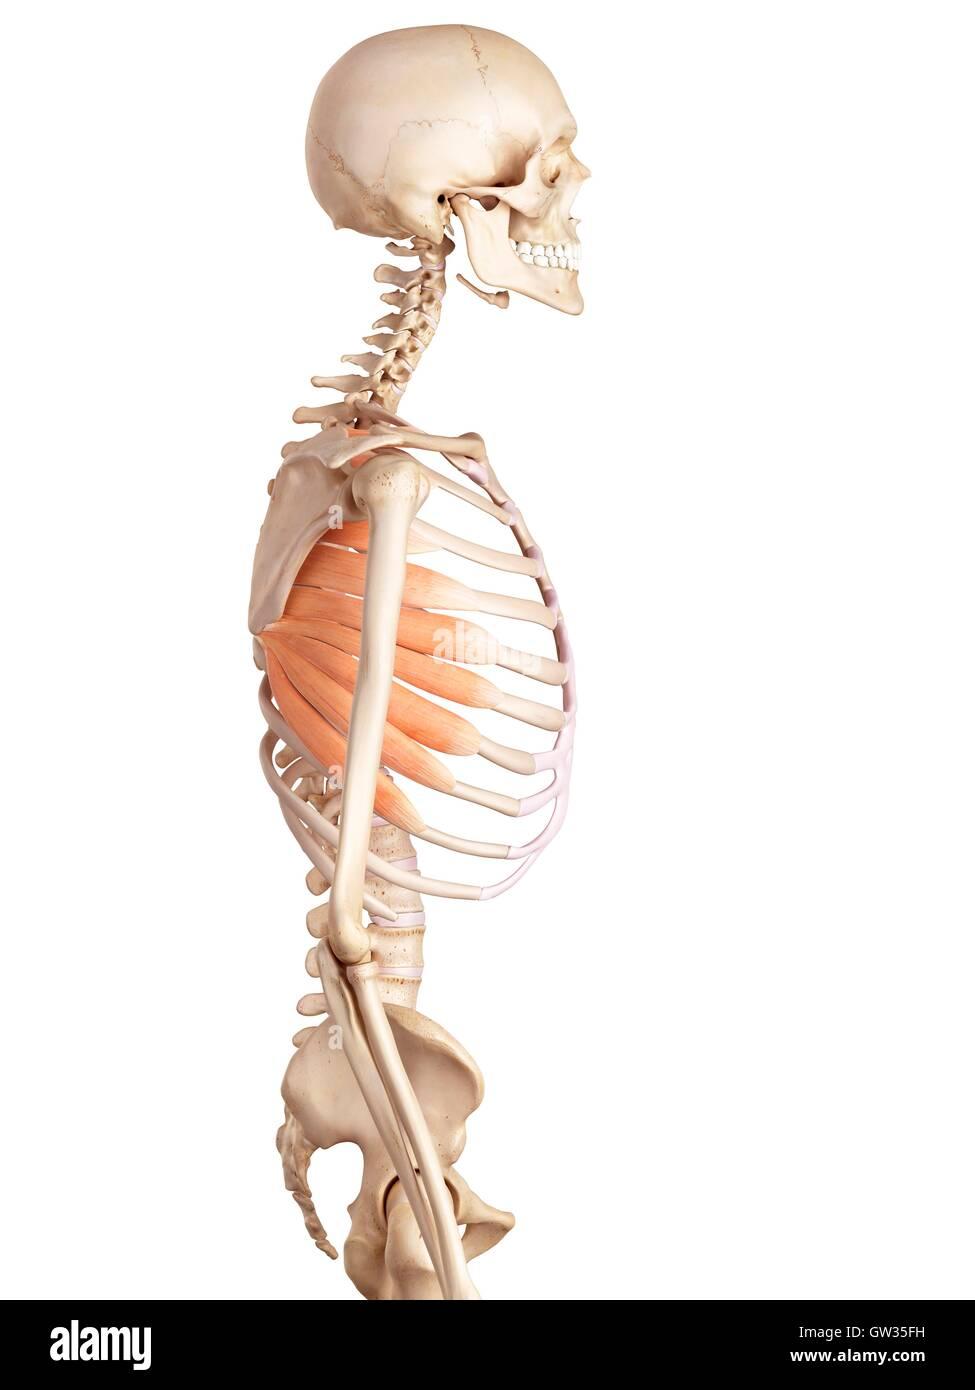 Human rib muscles, illustration Stock Photo: 118698821 - Alamy